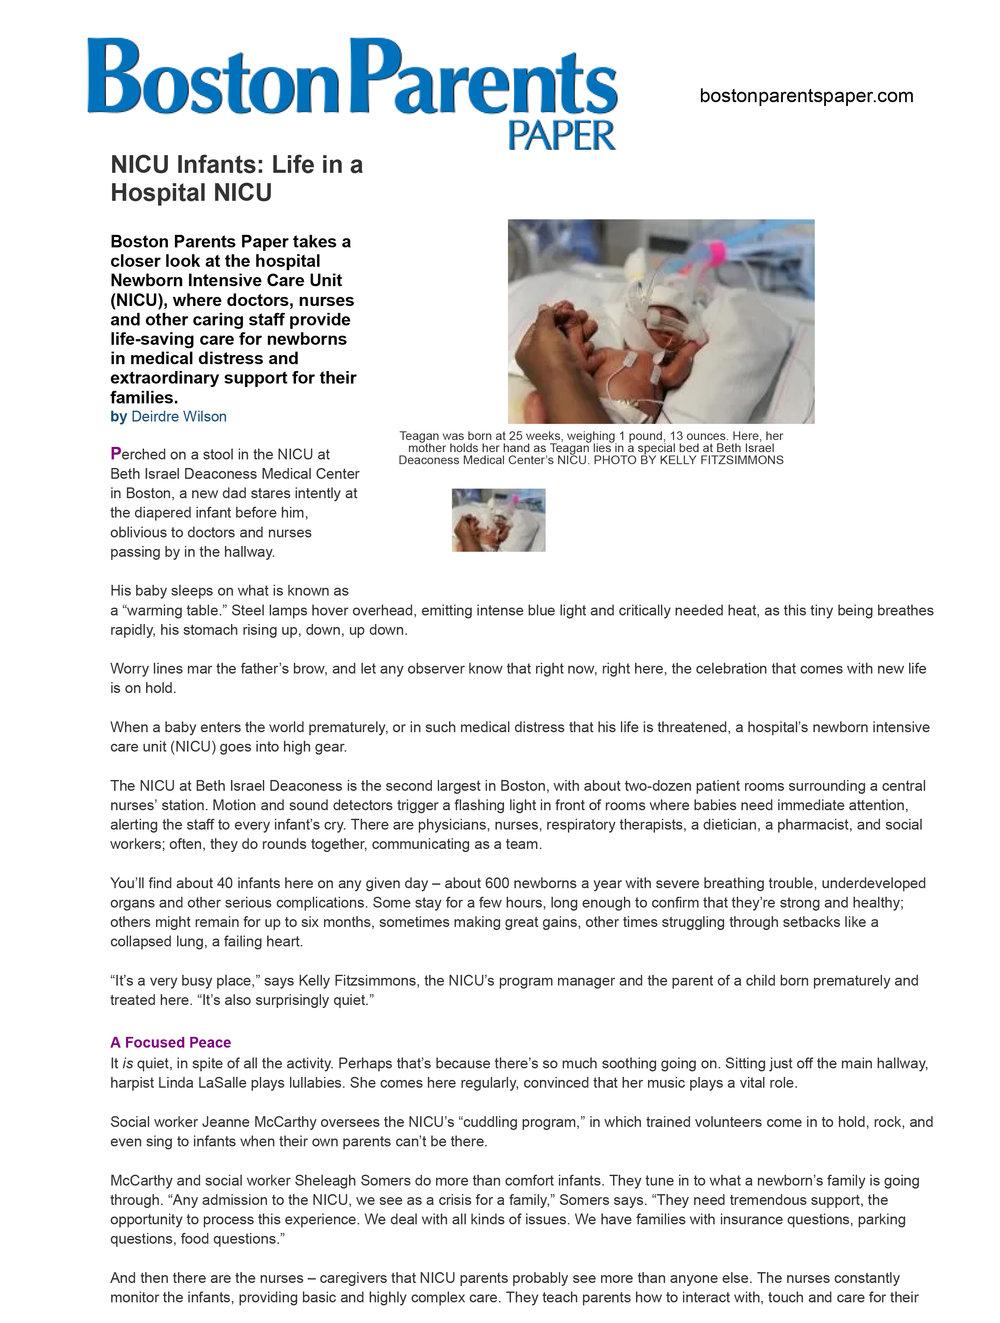 Life at Beth Israel Beth Israel Deaconess | Boston Parents Paper-1.jpg